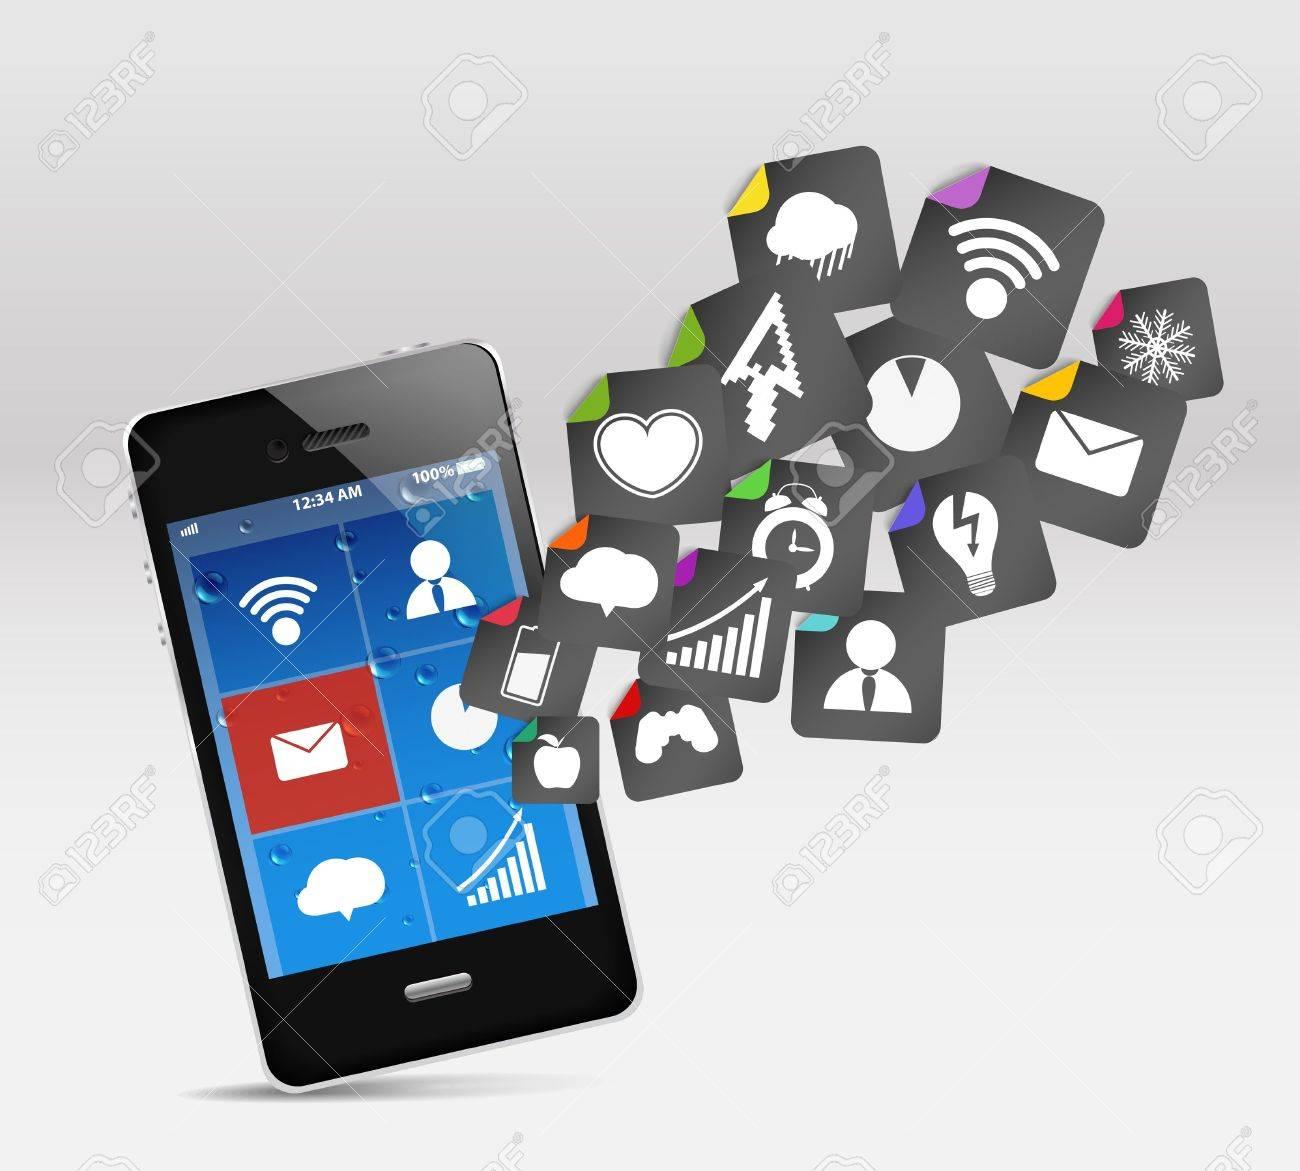 Modern mobile phone and social media Stock Vector - 13007292